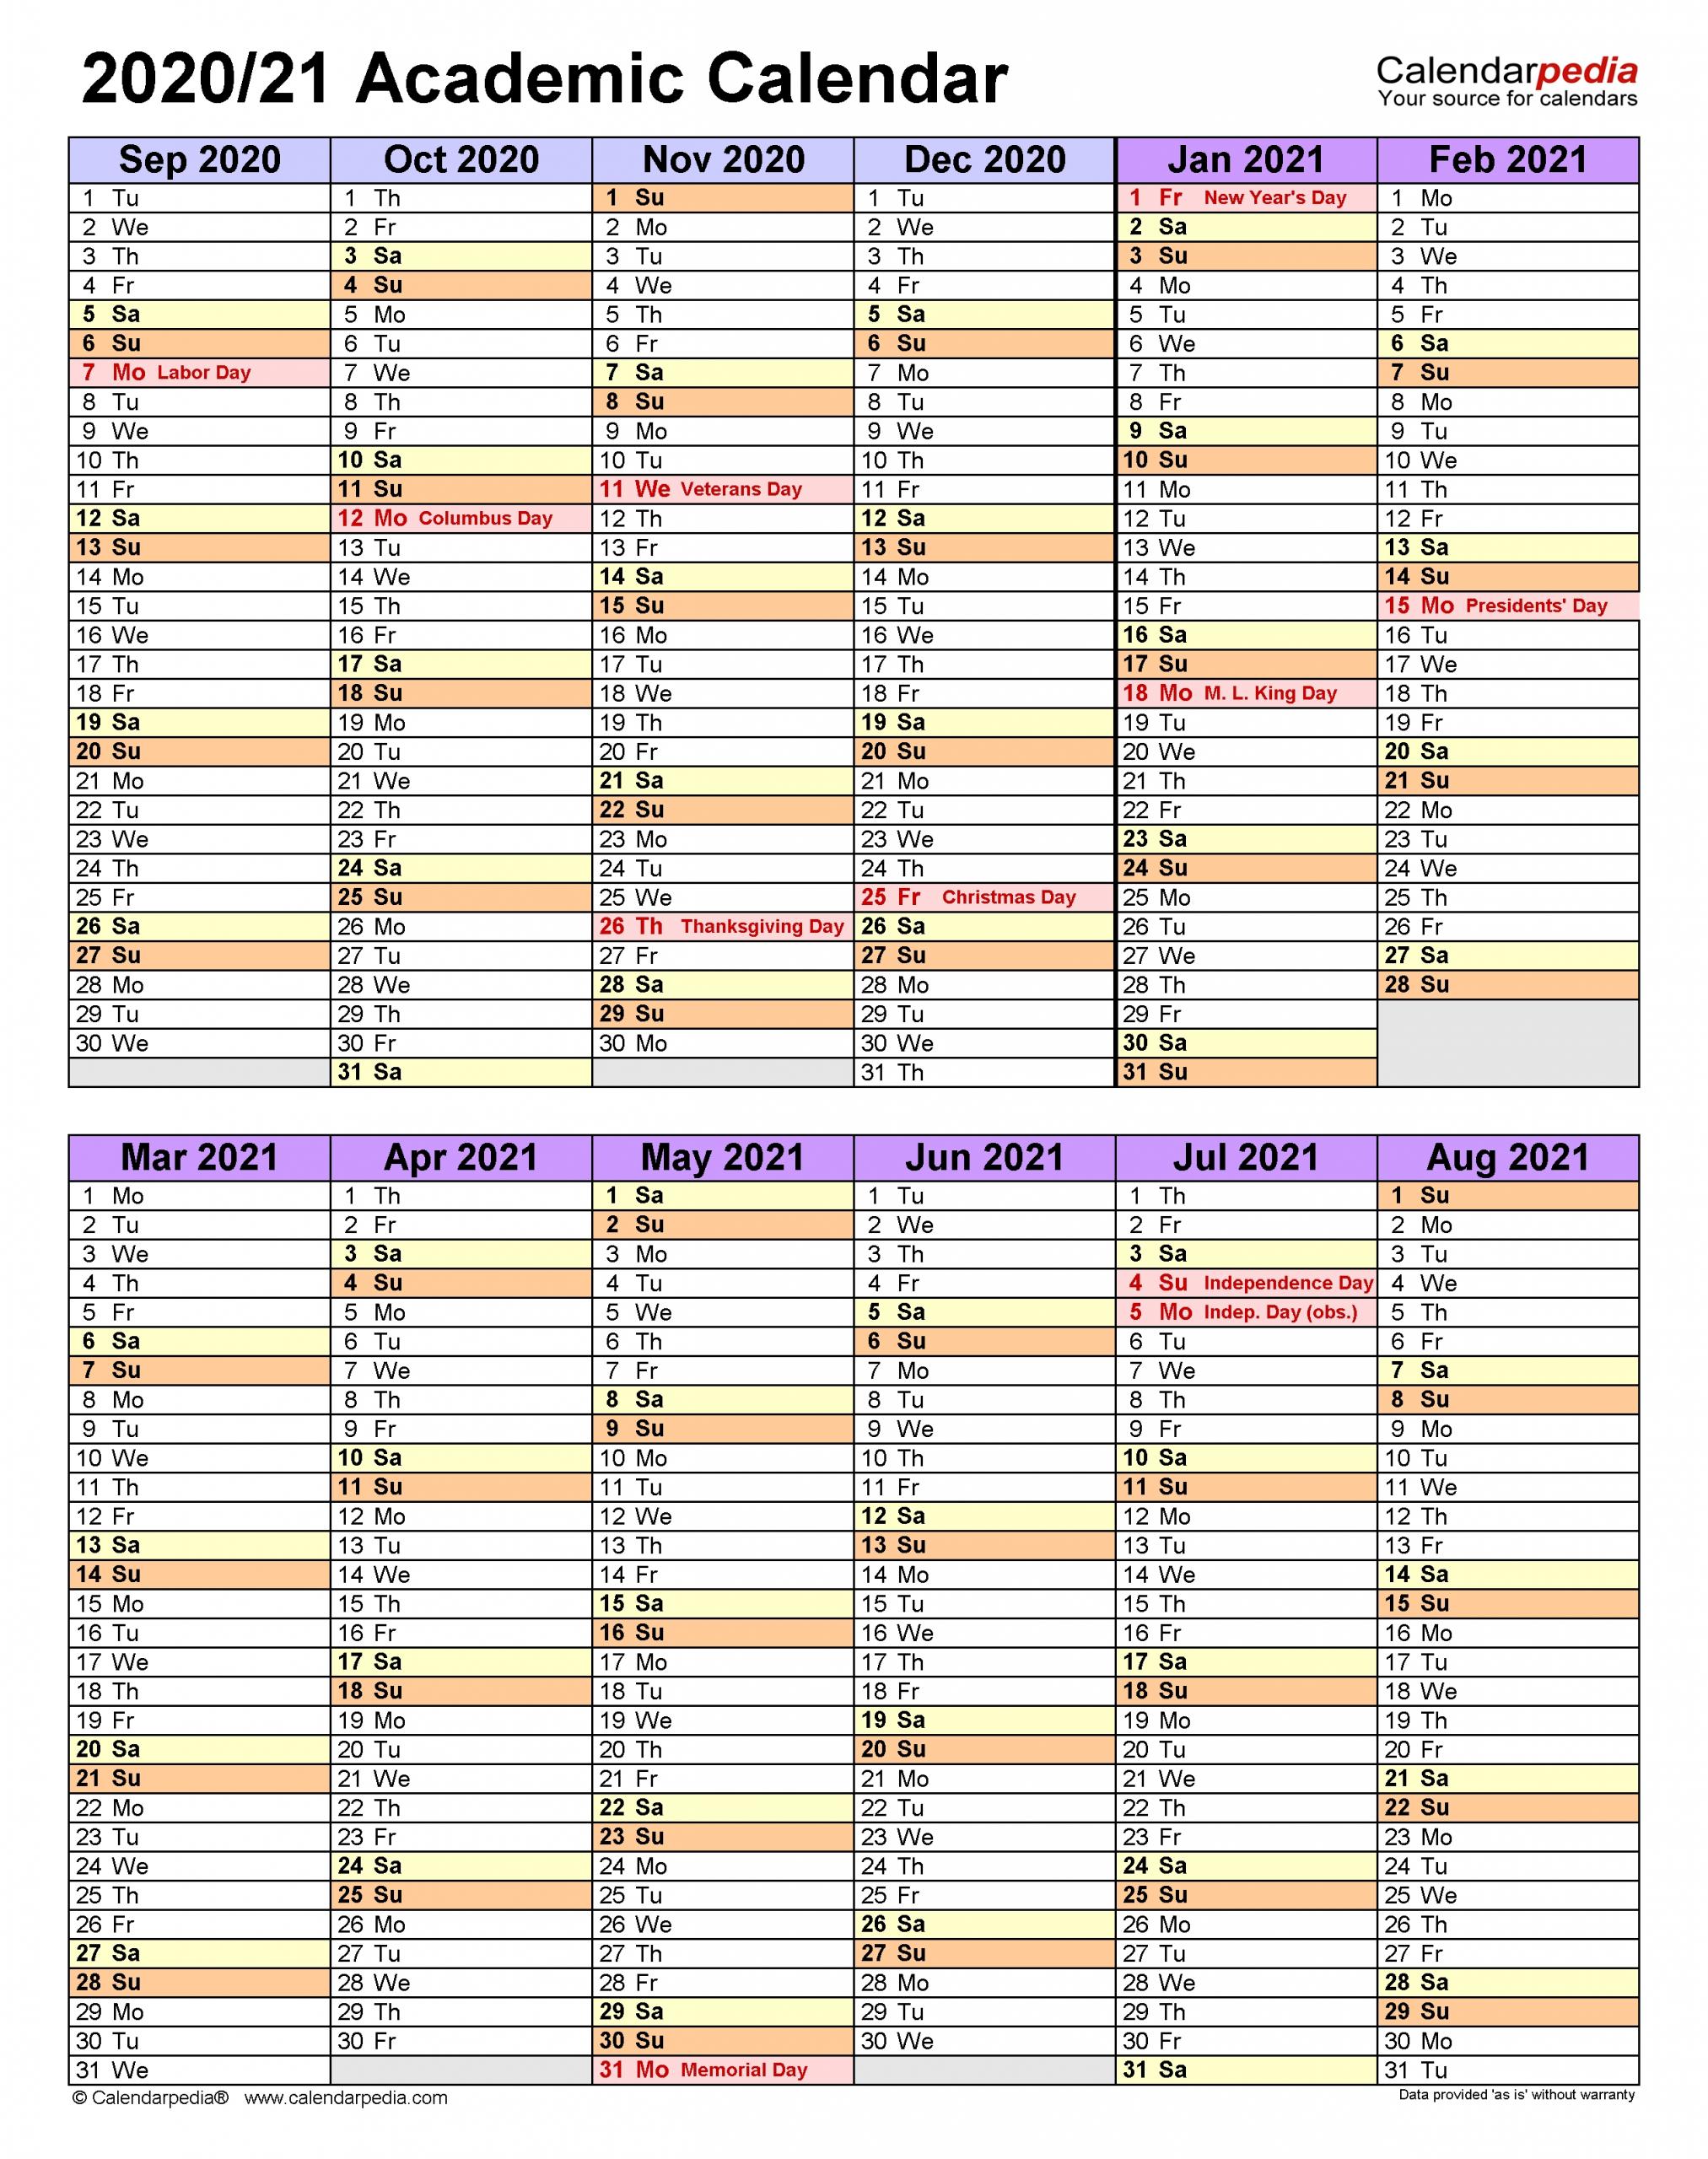 Academic Calendars 2020/2021 - Free Printable Word Templates